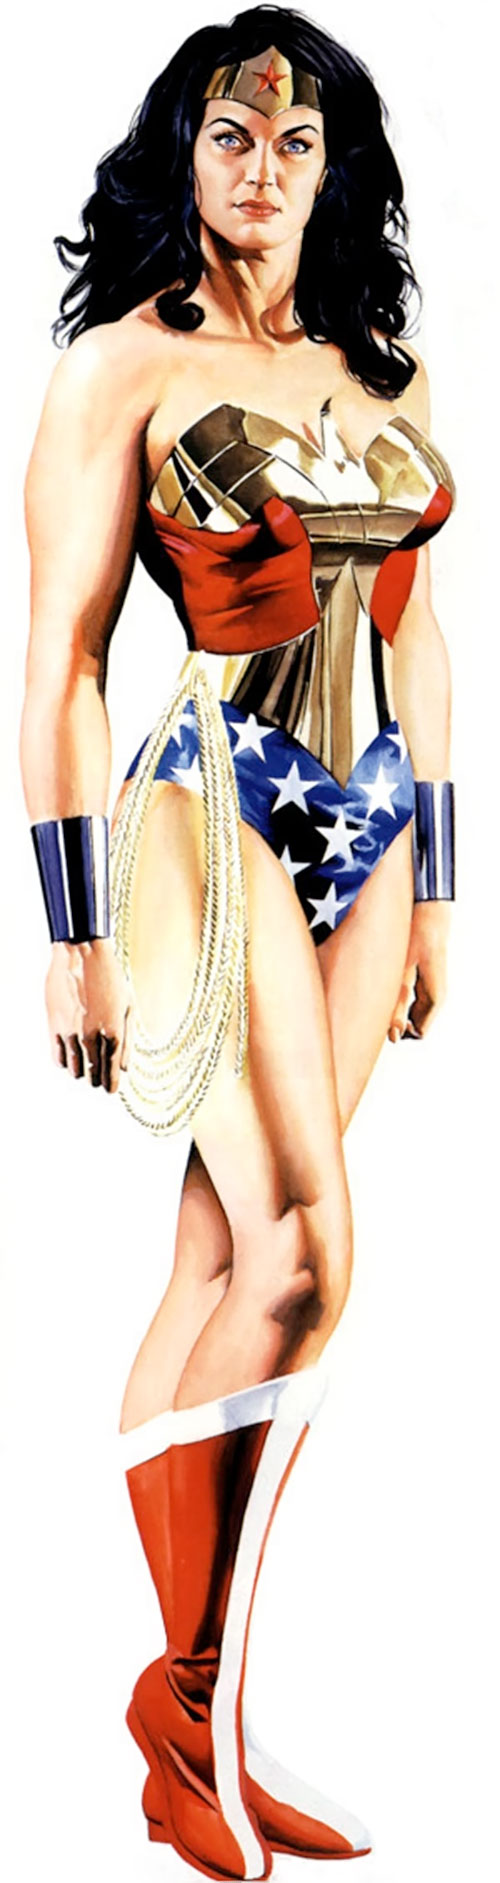 Wonder Woman (DC Comics) by Alex Ross